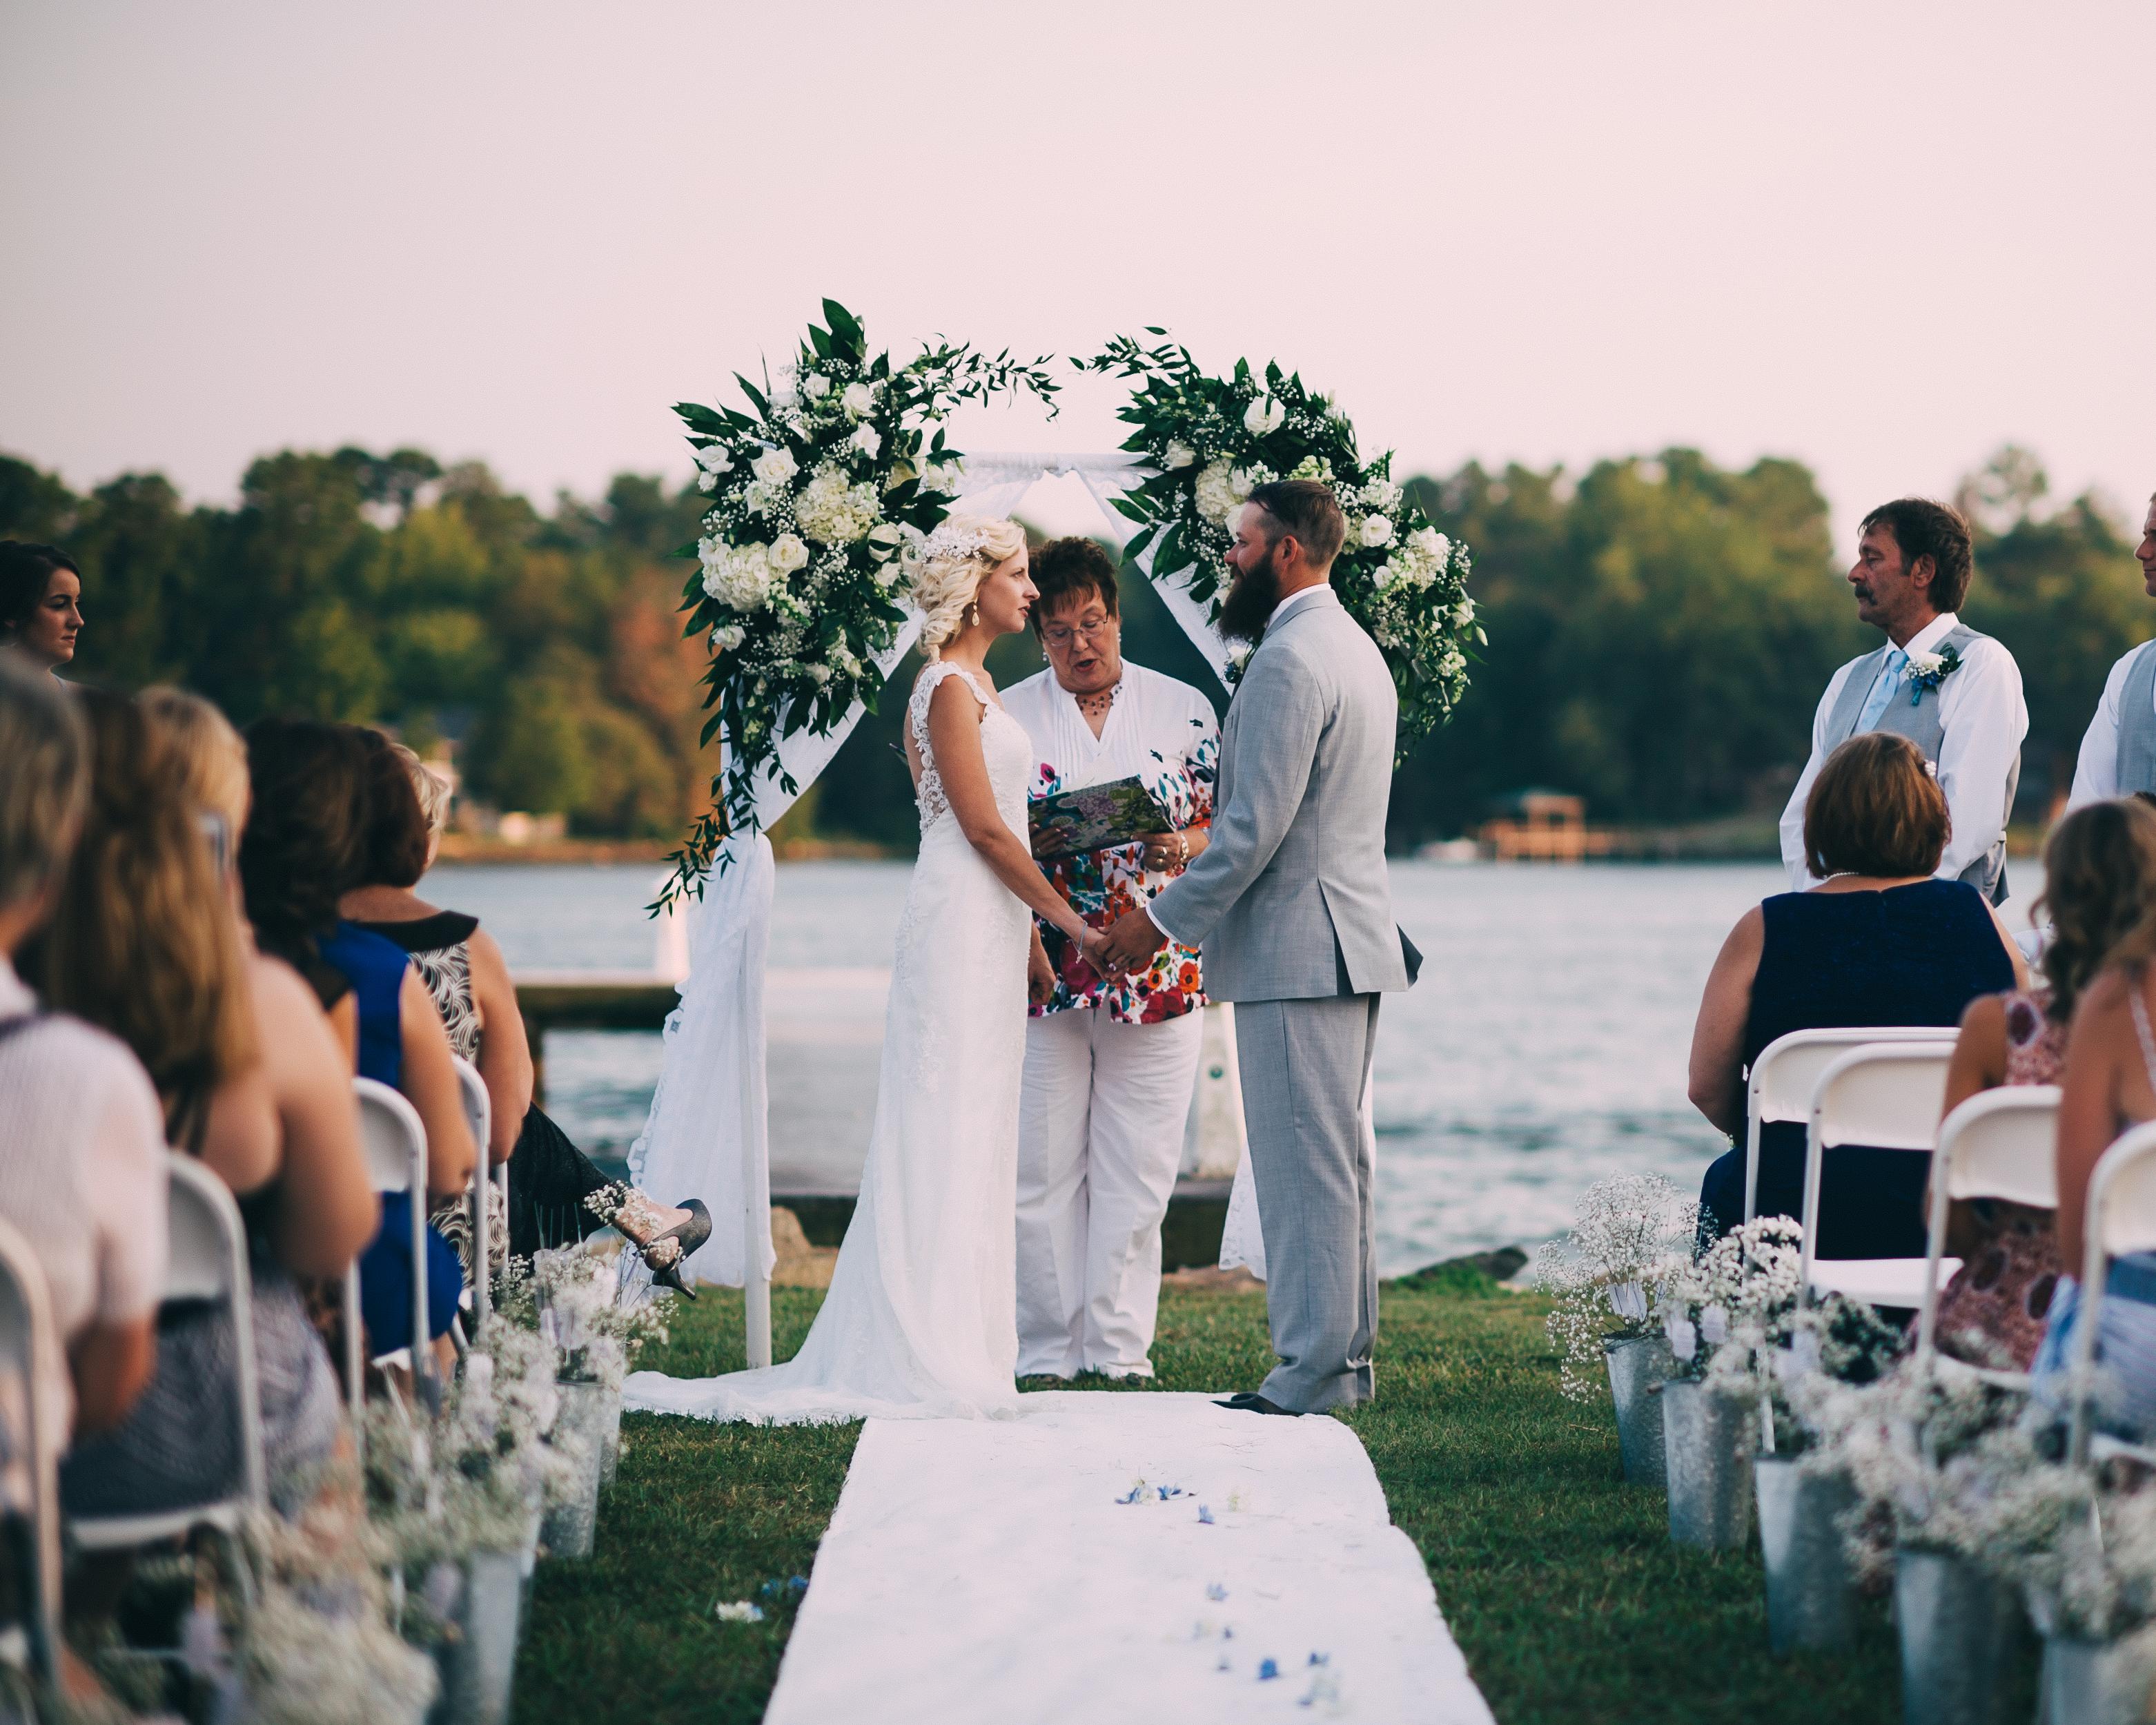 LAKE WYLIE WEDDING PHOTOGRAPERS